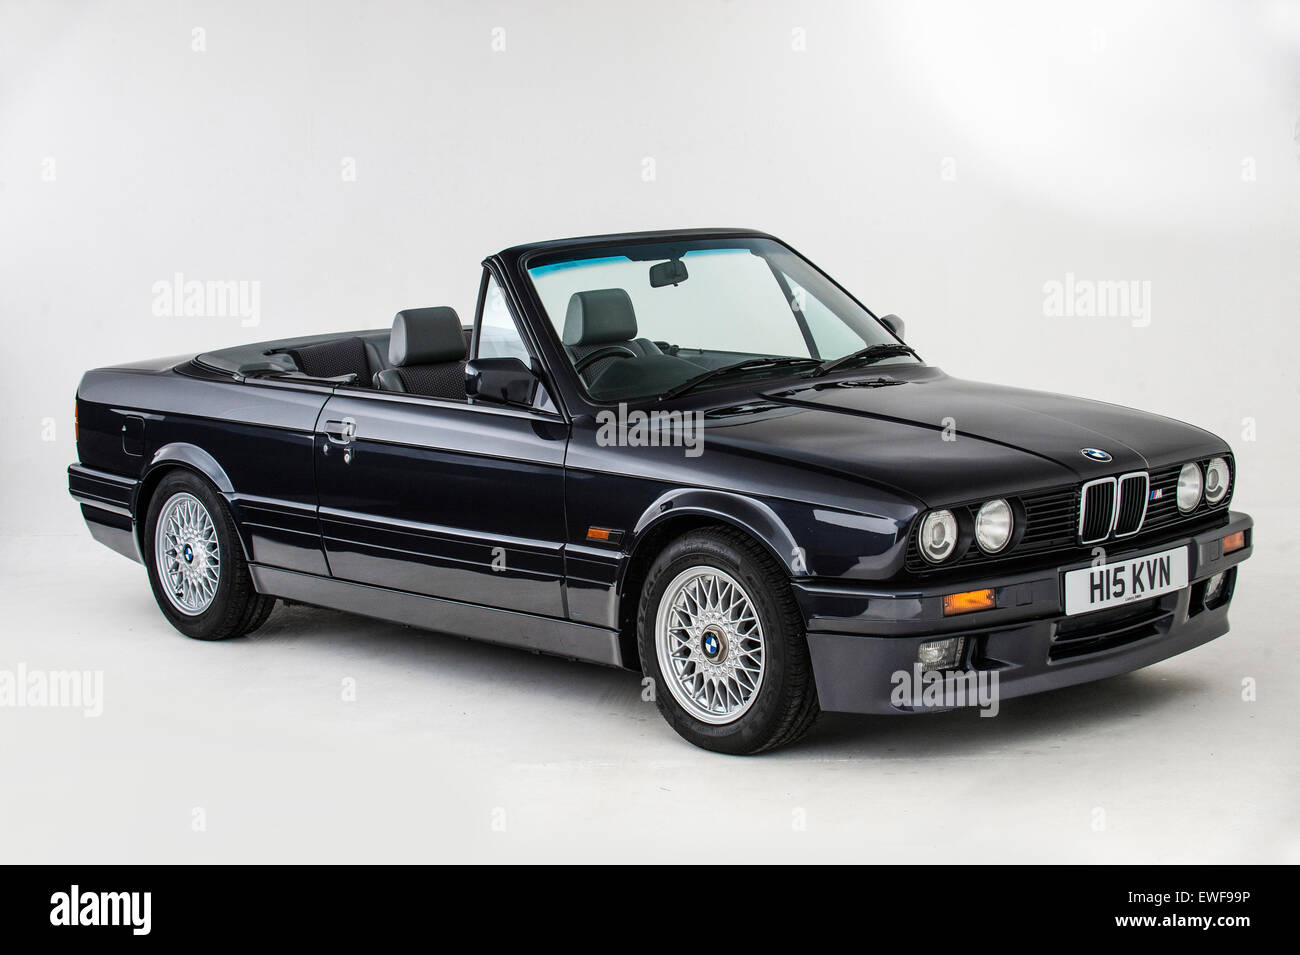 1990 BMW M325i - Stock Image